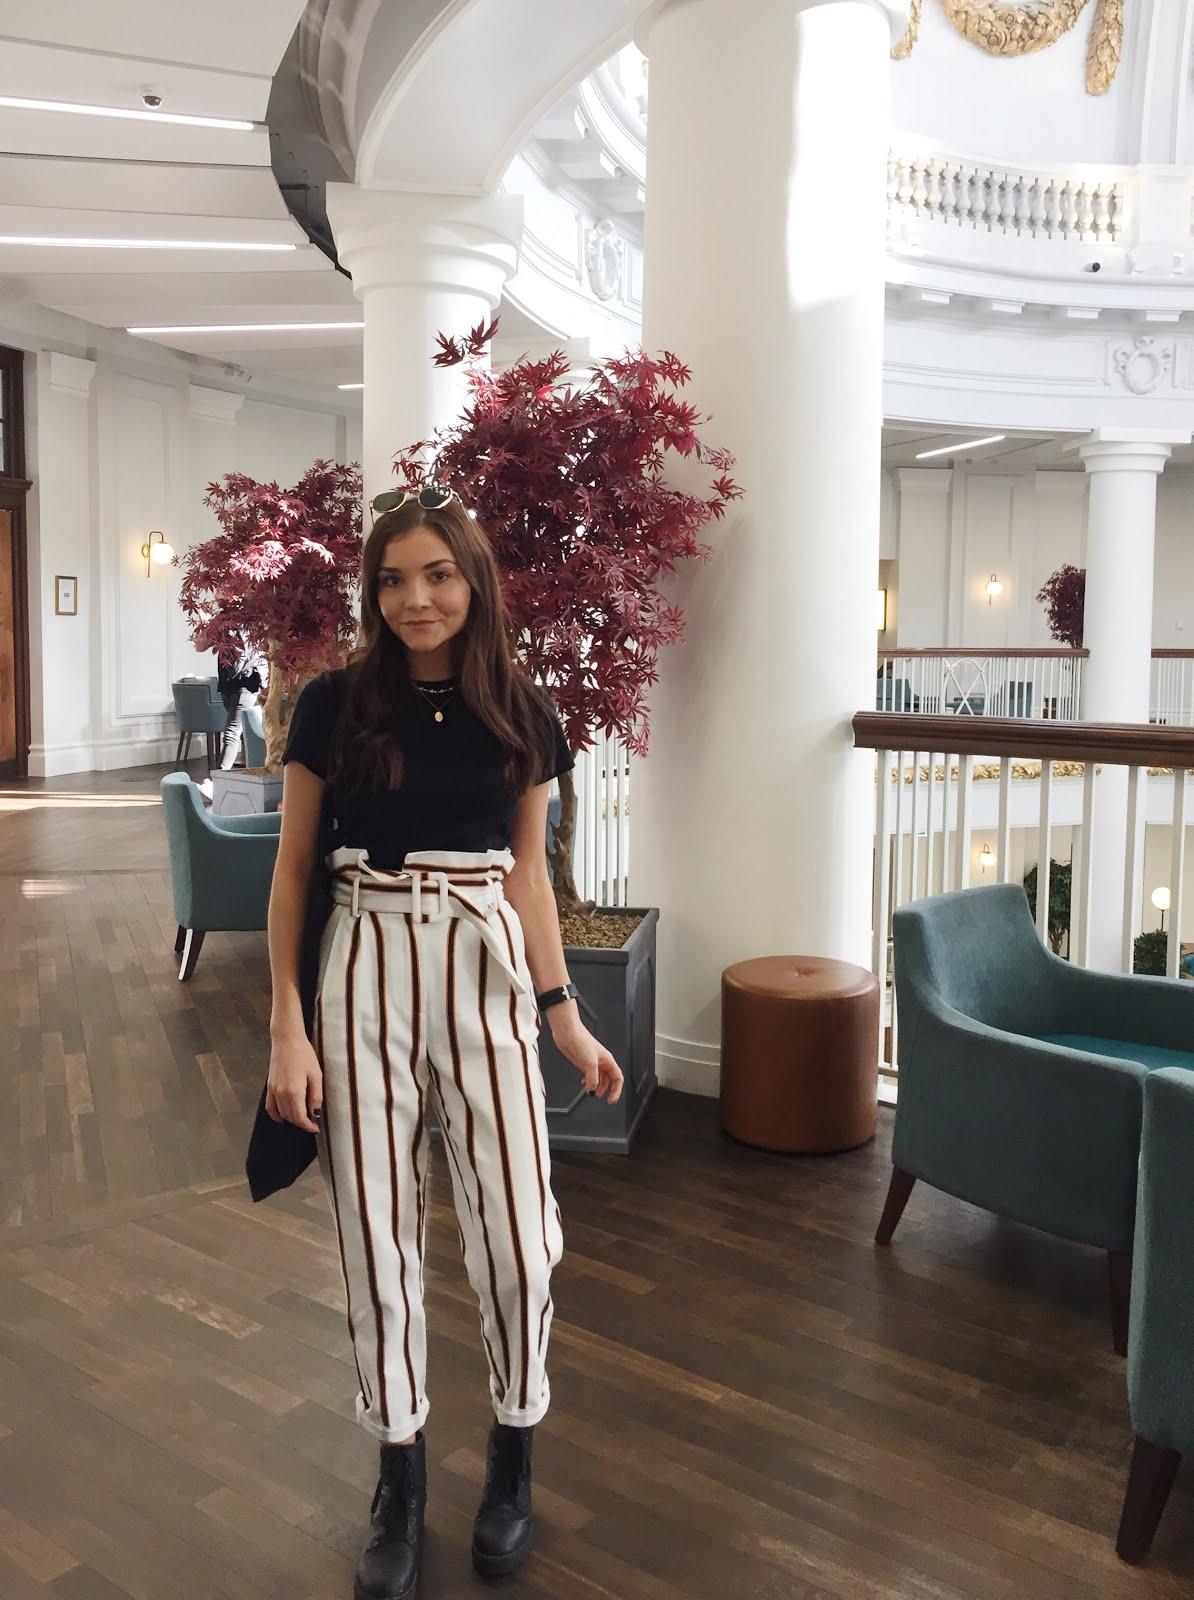 Fashion blogger at Spanish City, Whitley Bay